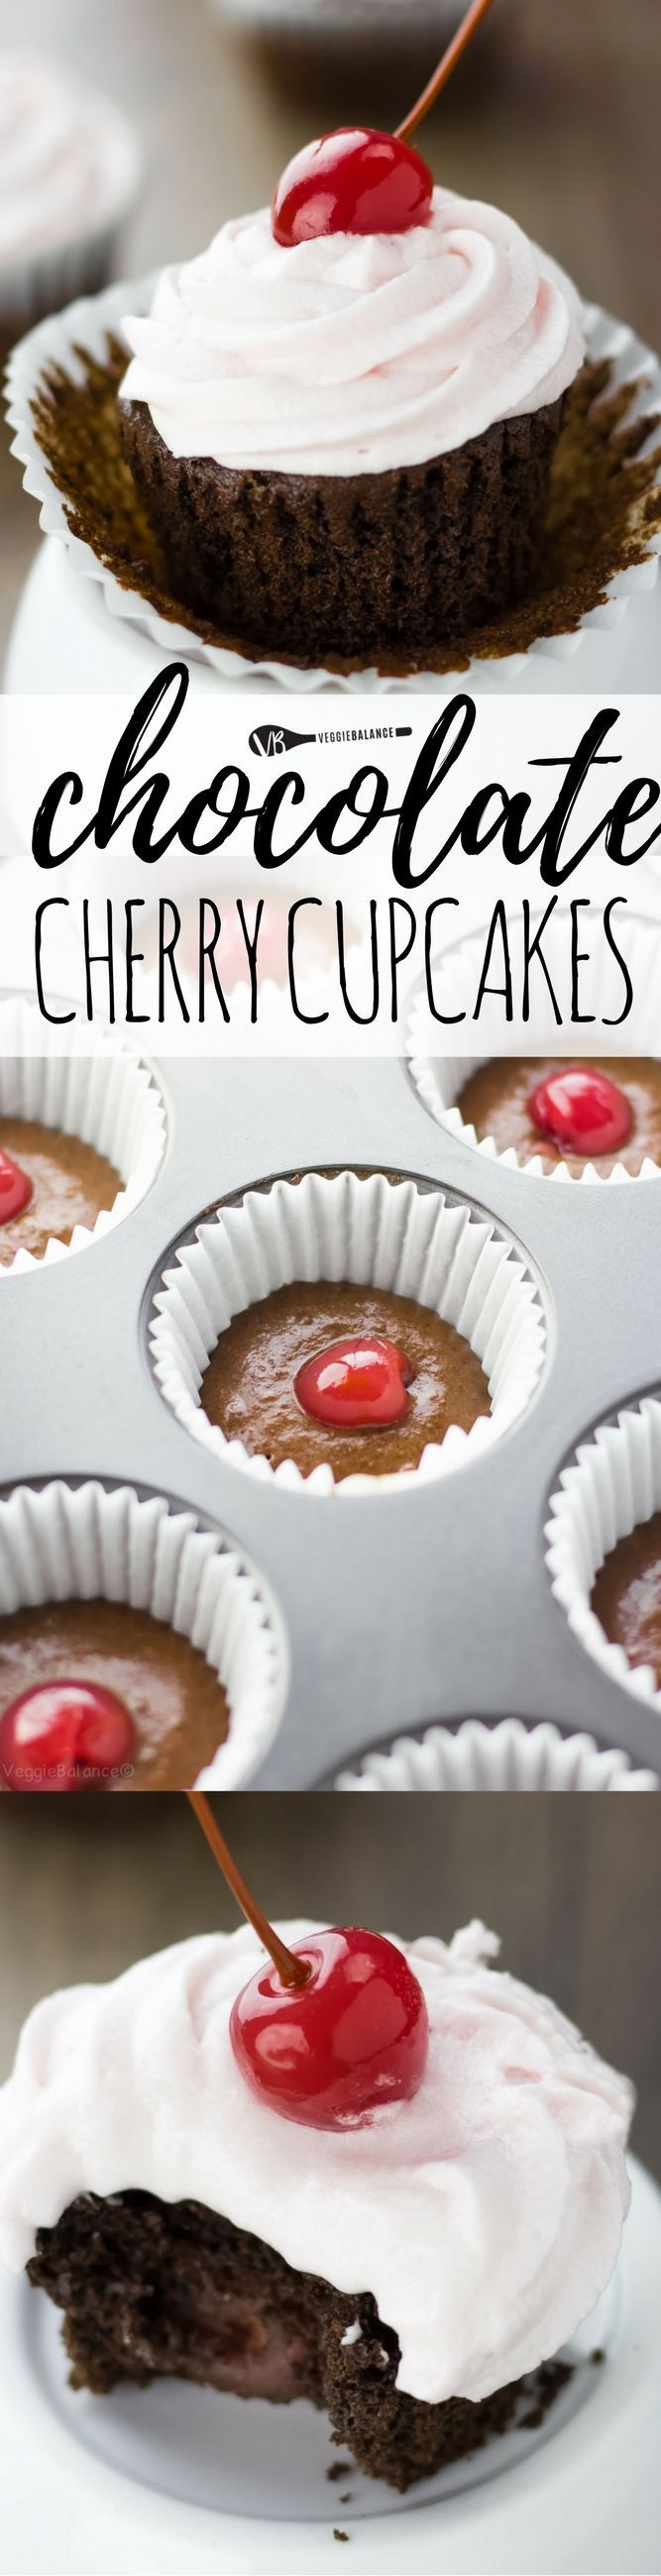 412 best Cupcakes images on Pinterest | Cupcake recipes, Dessert ...